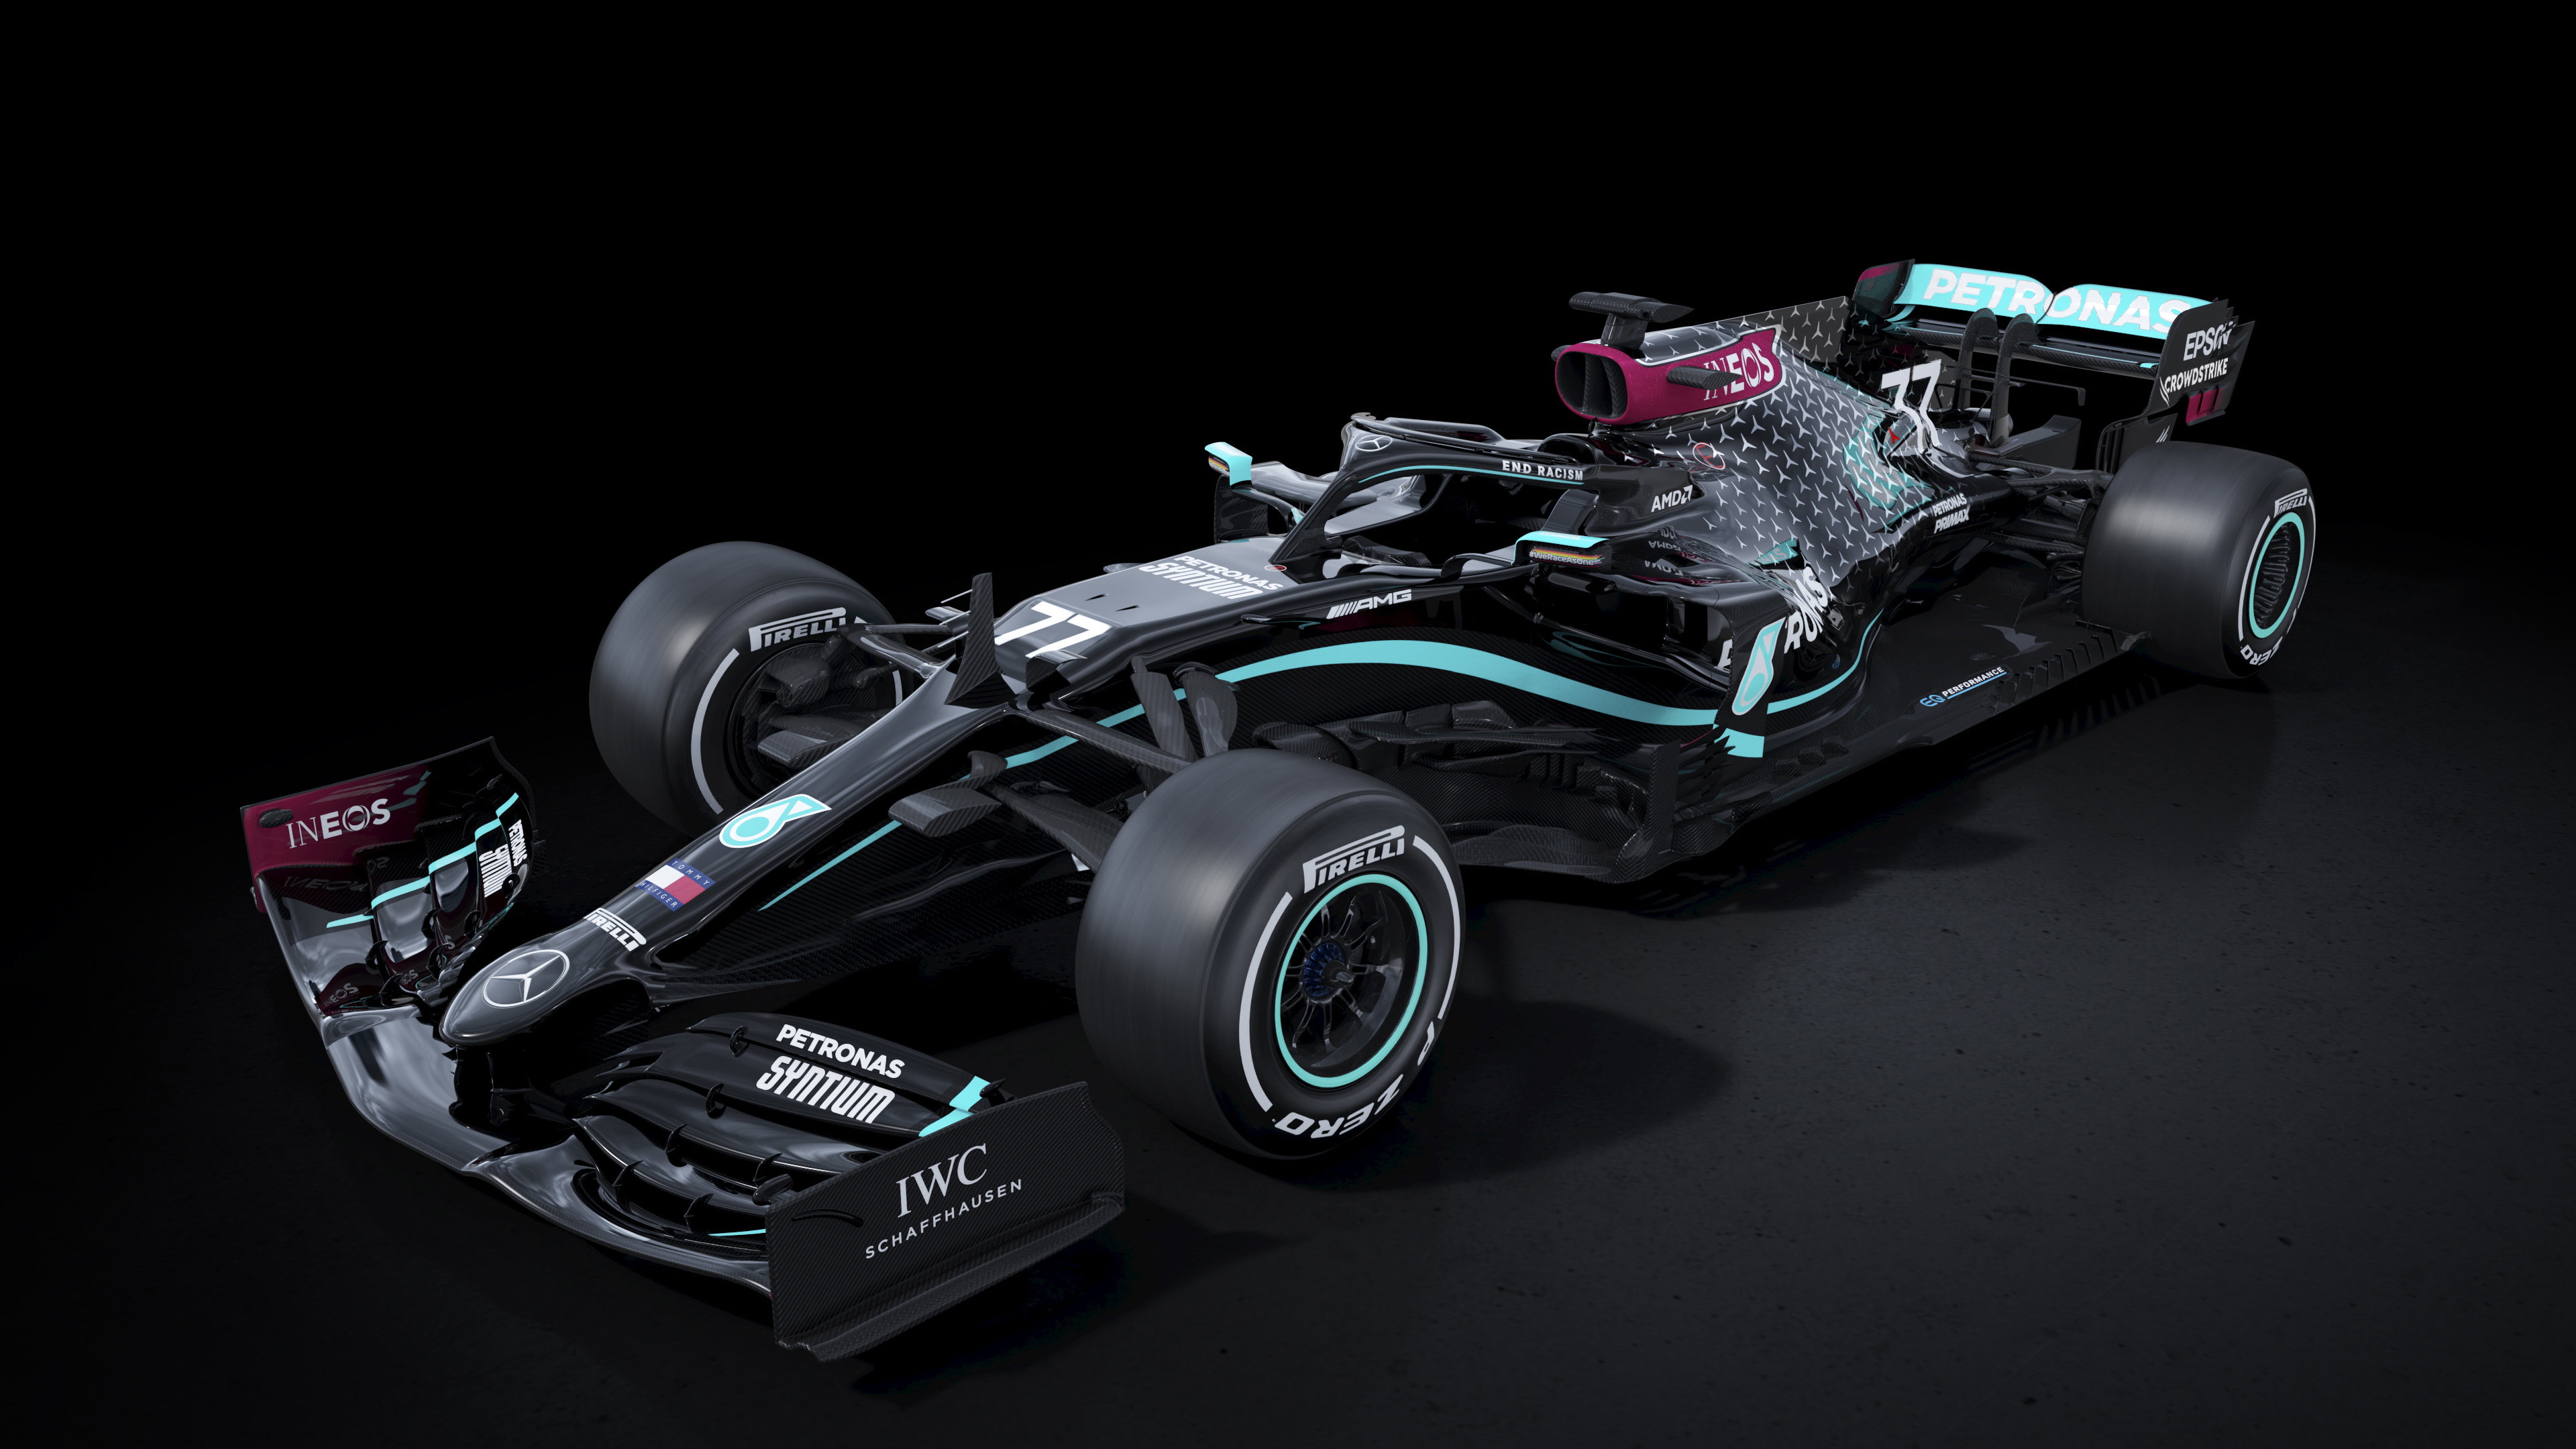 Mercedes AMG F1 W11 EQ Performance 2020 4K 2 Wallpaper HD Car 3840x2160